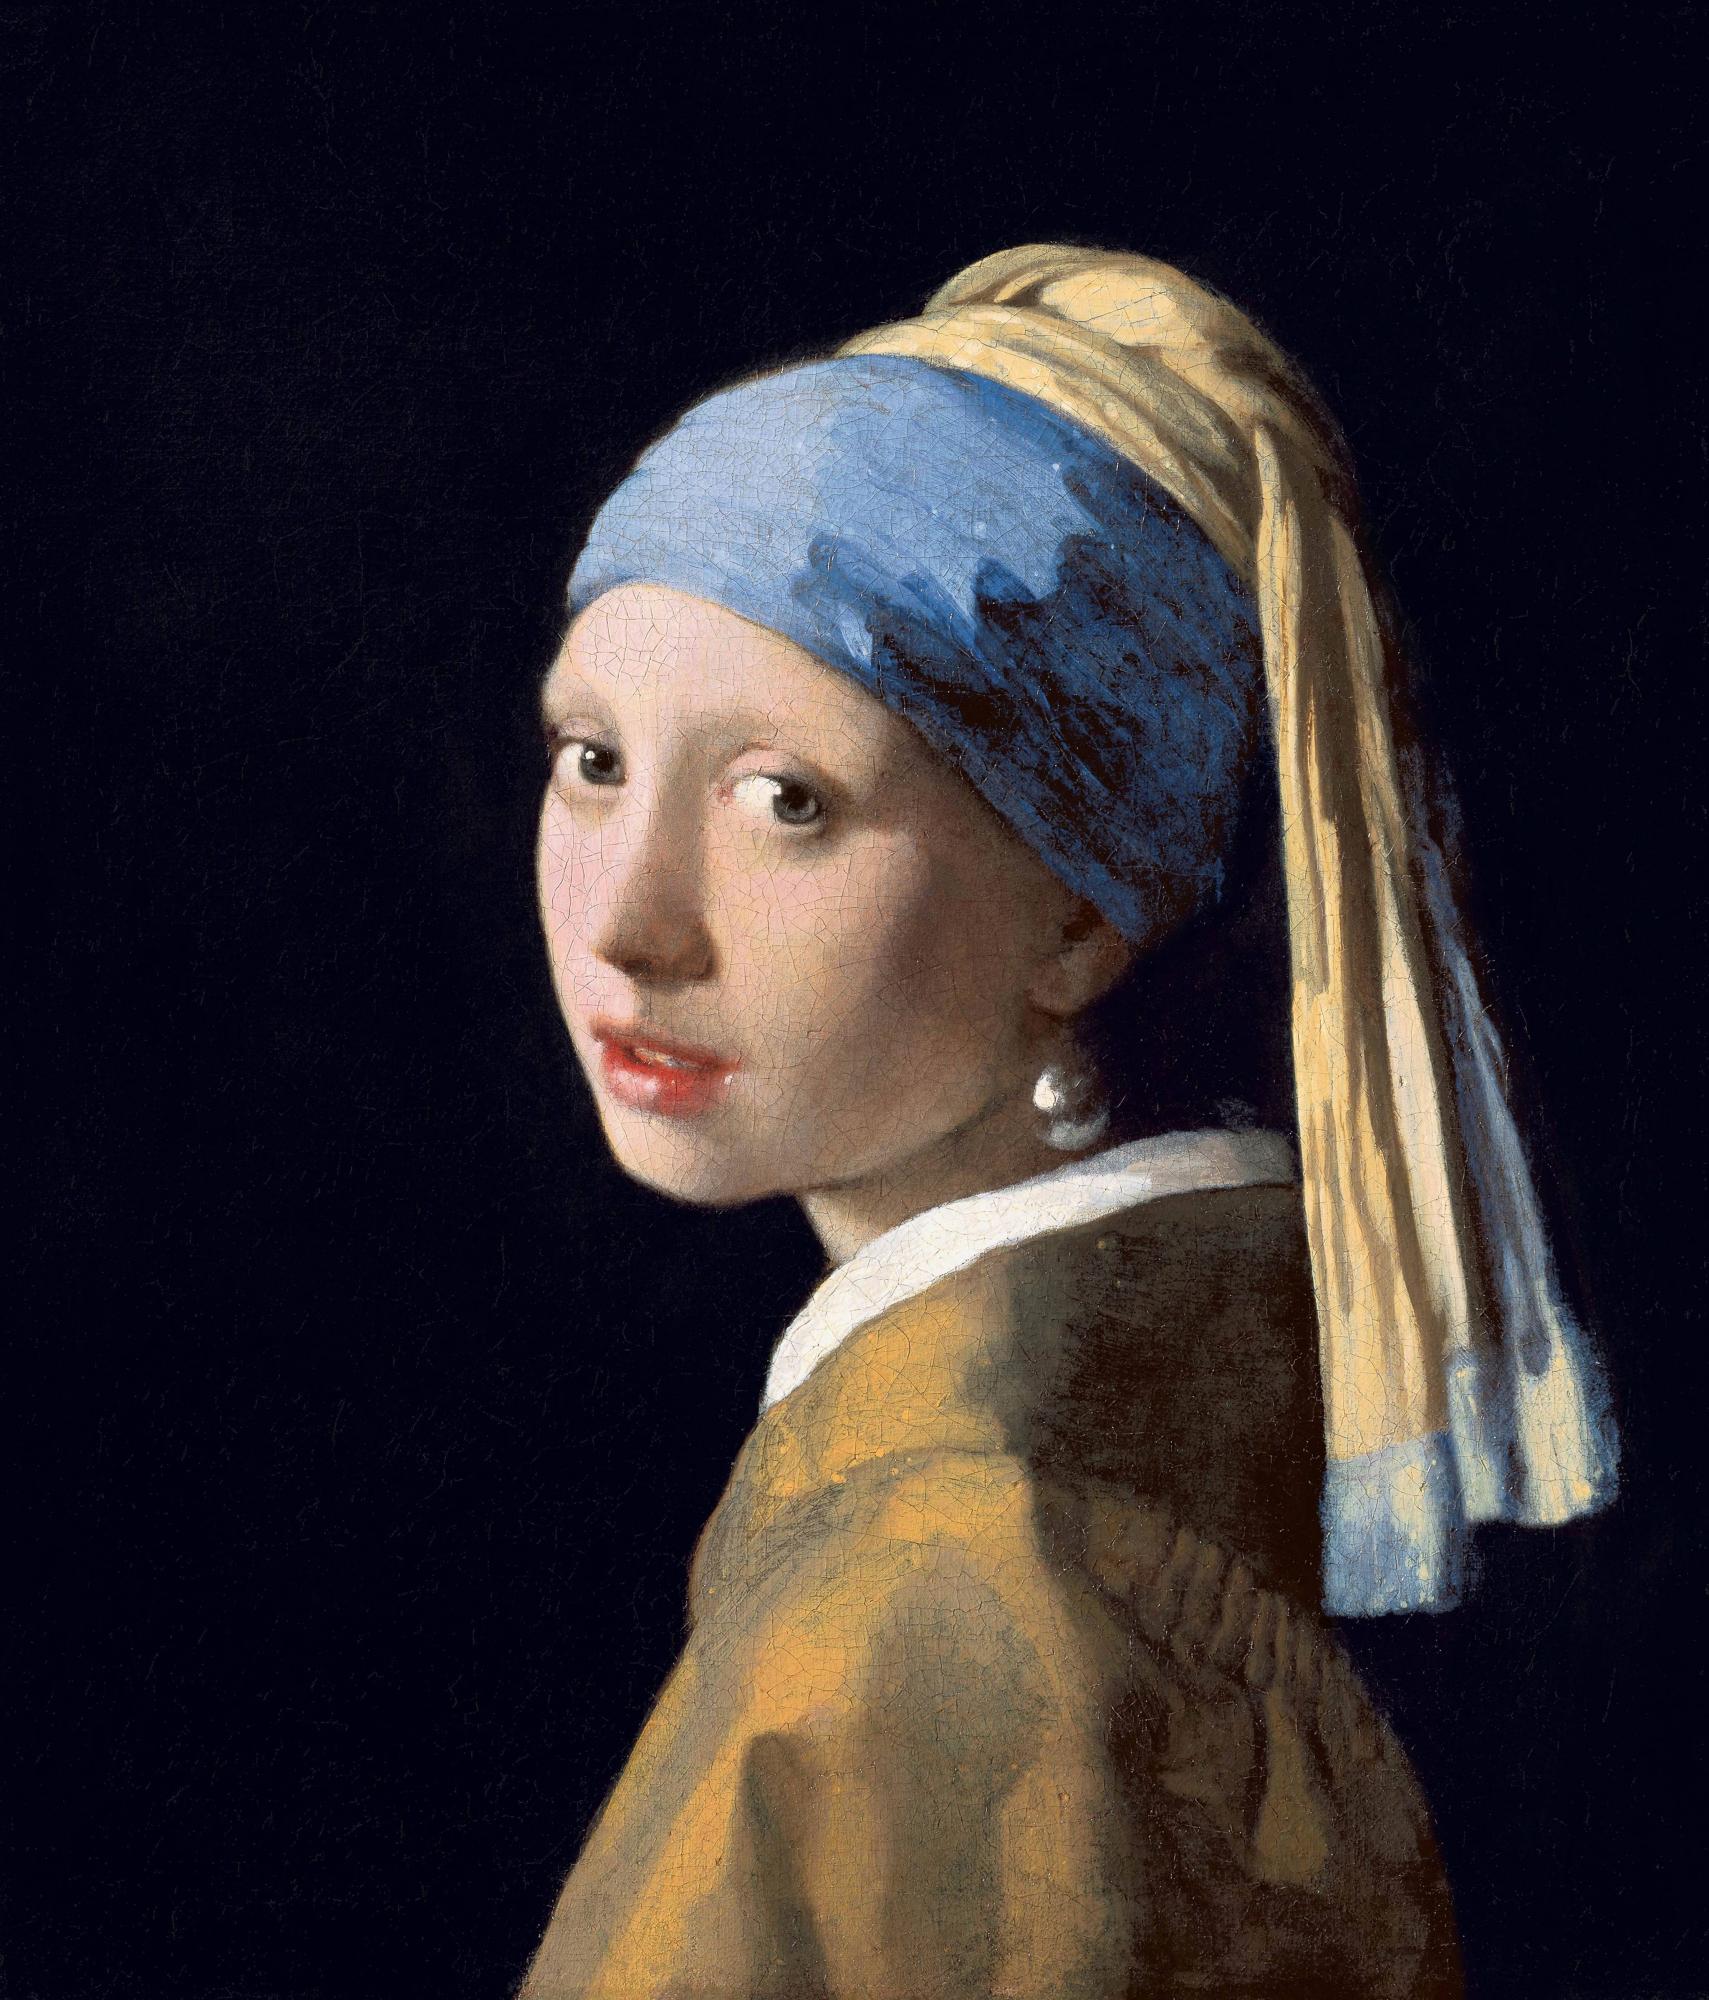 factor alguna cosa Enumerar  La joven de la perla - Johannes Vermeer - Historia Arte (HA!)